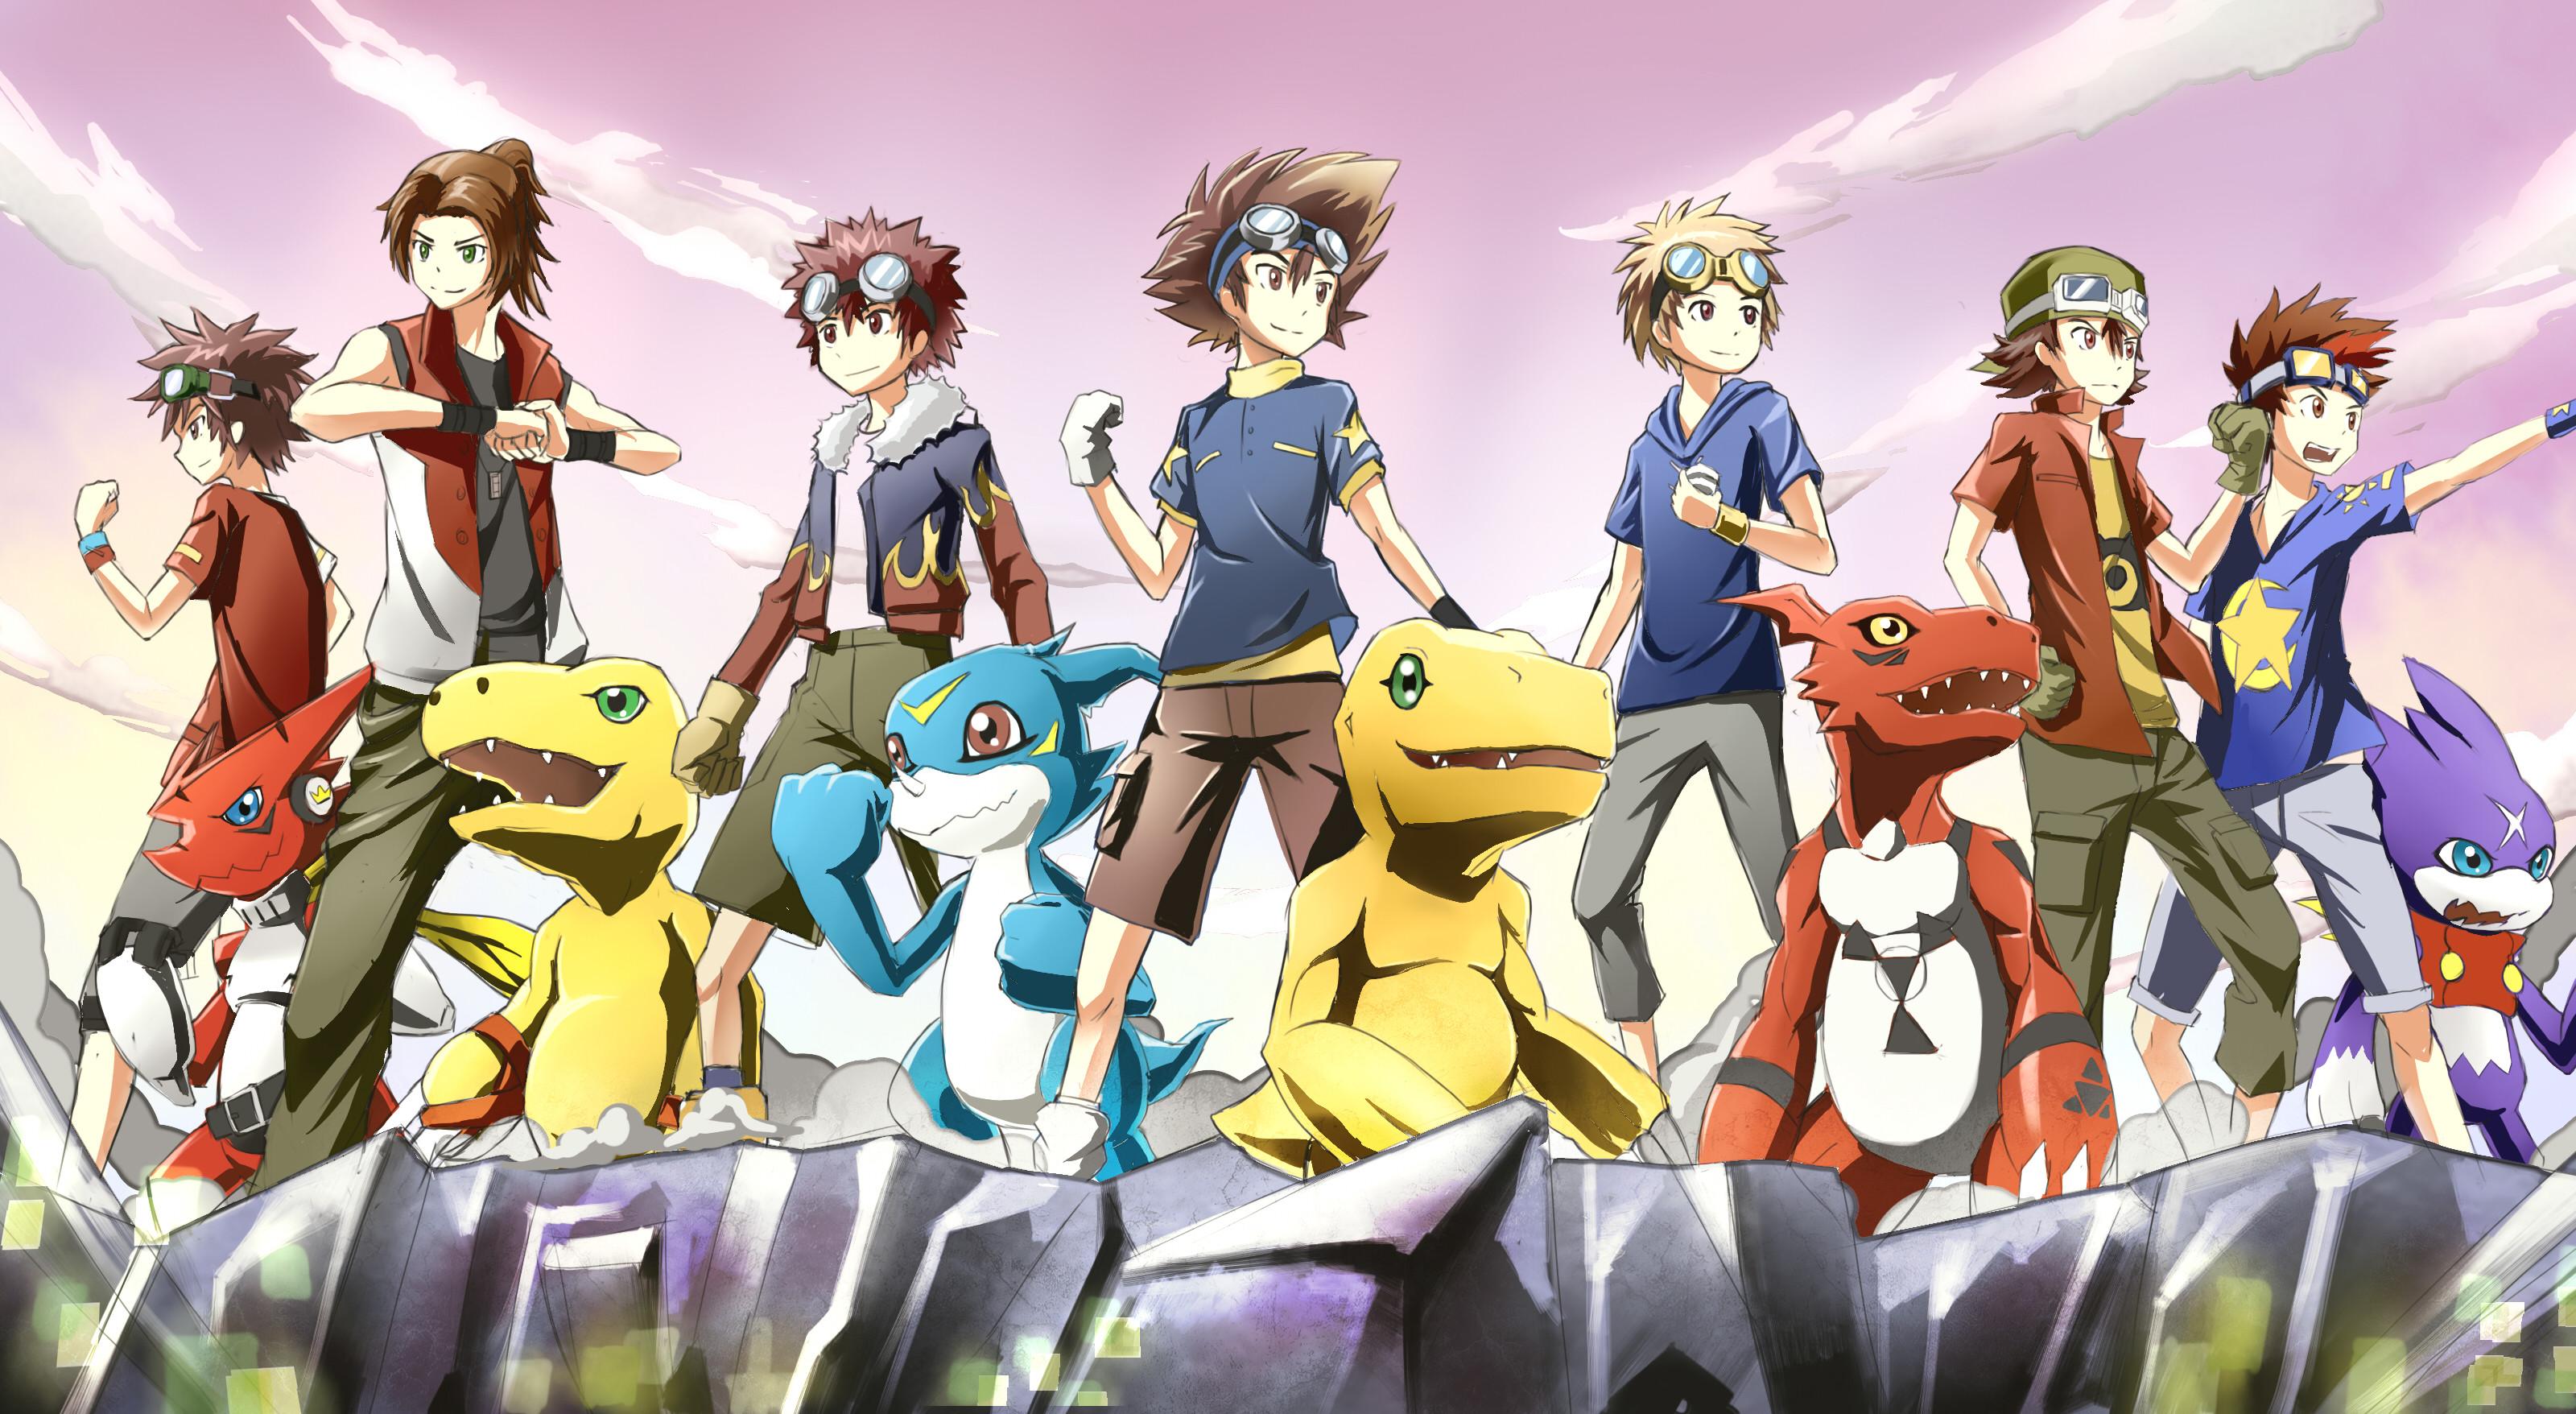 Res: 3200x1756, View Fullsize Digimon Adventure Image